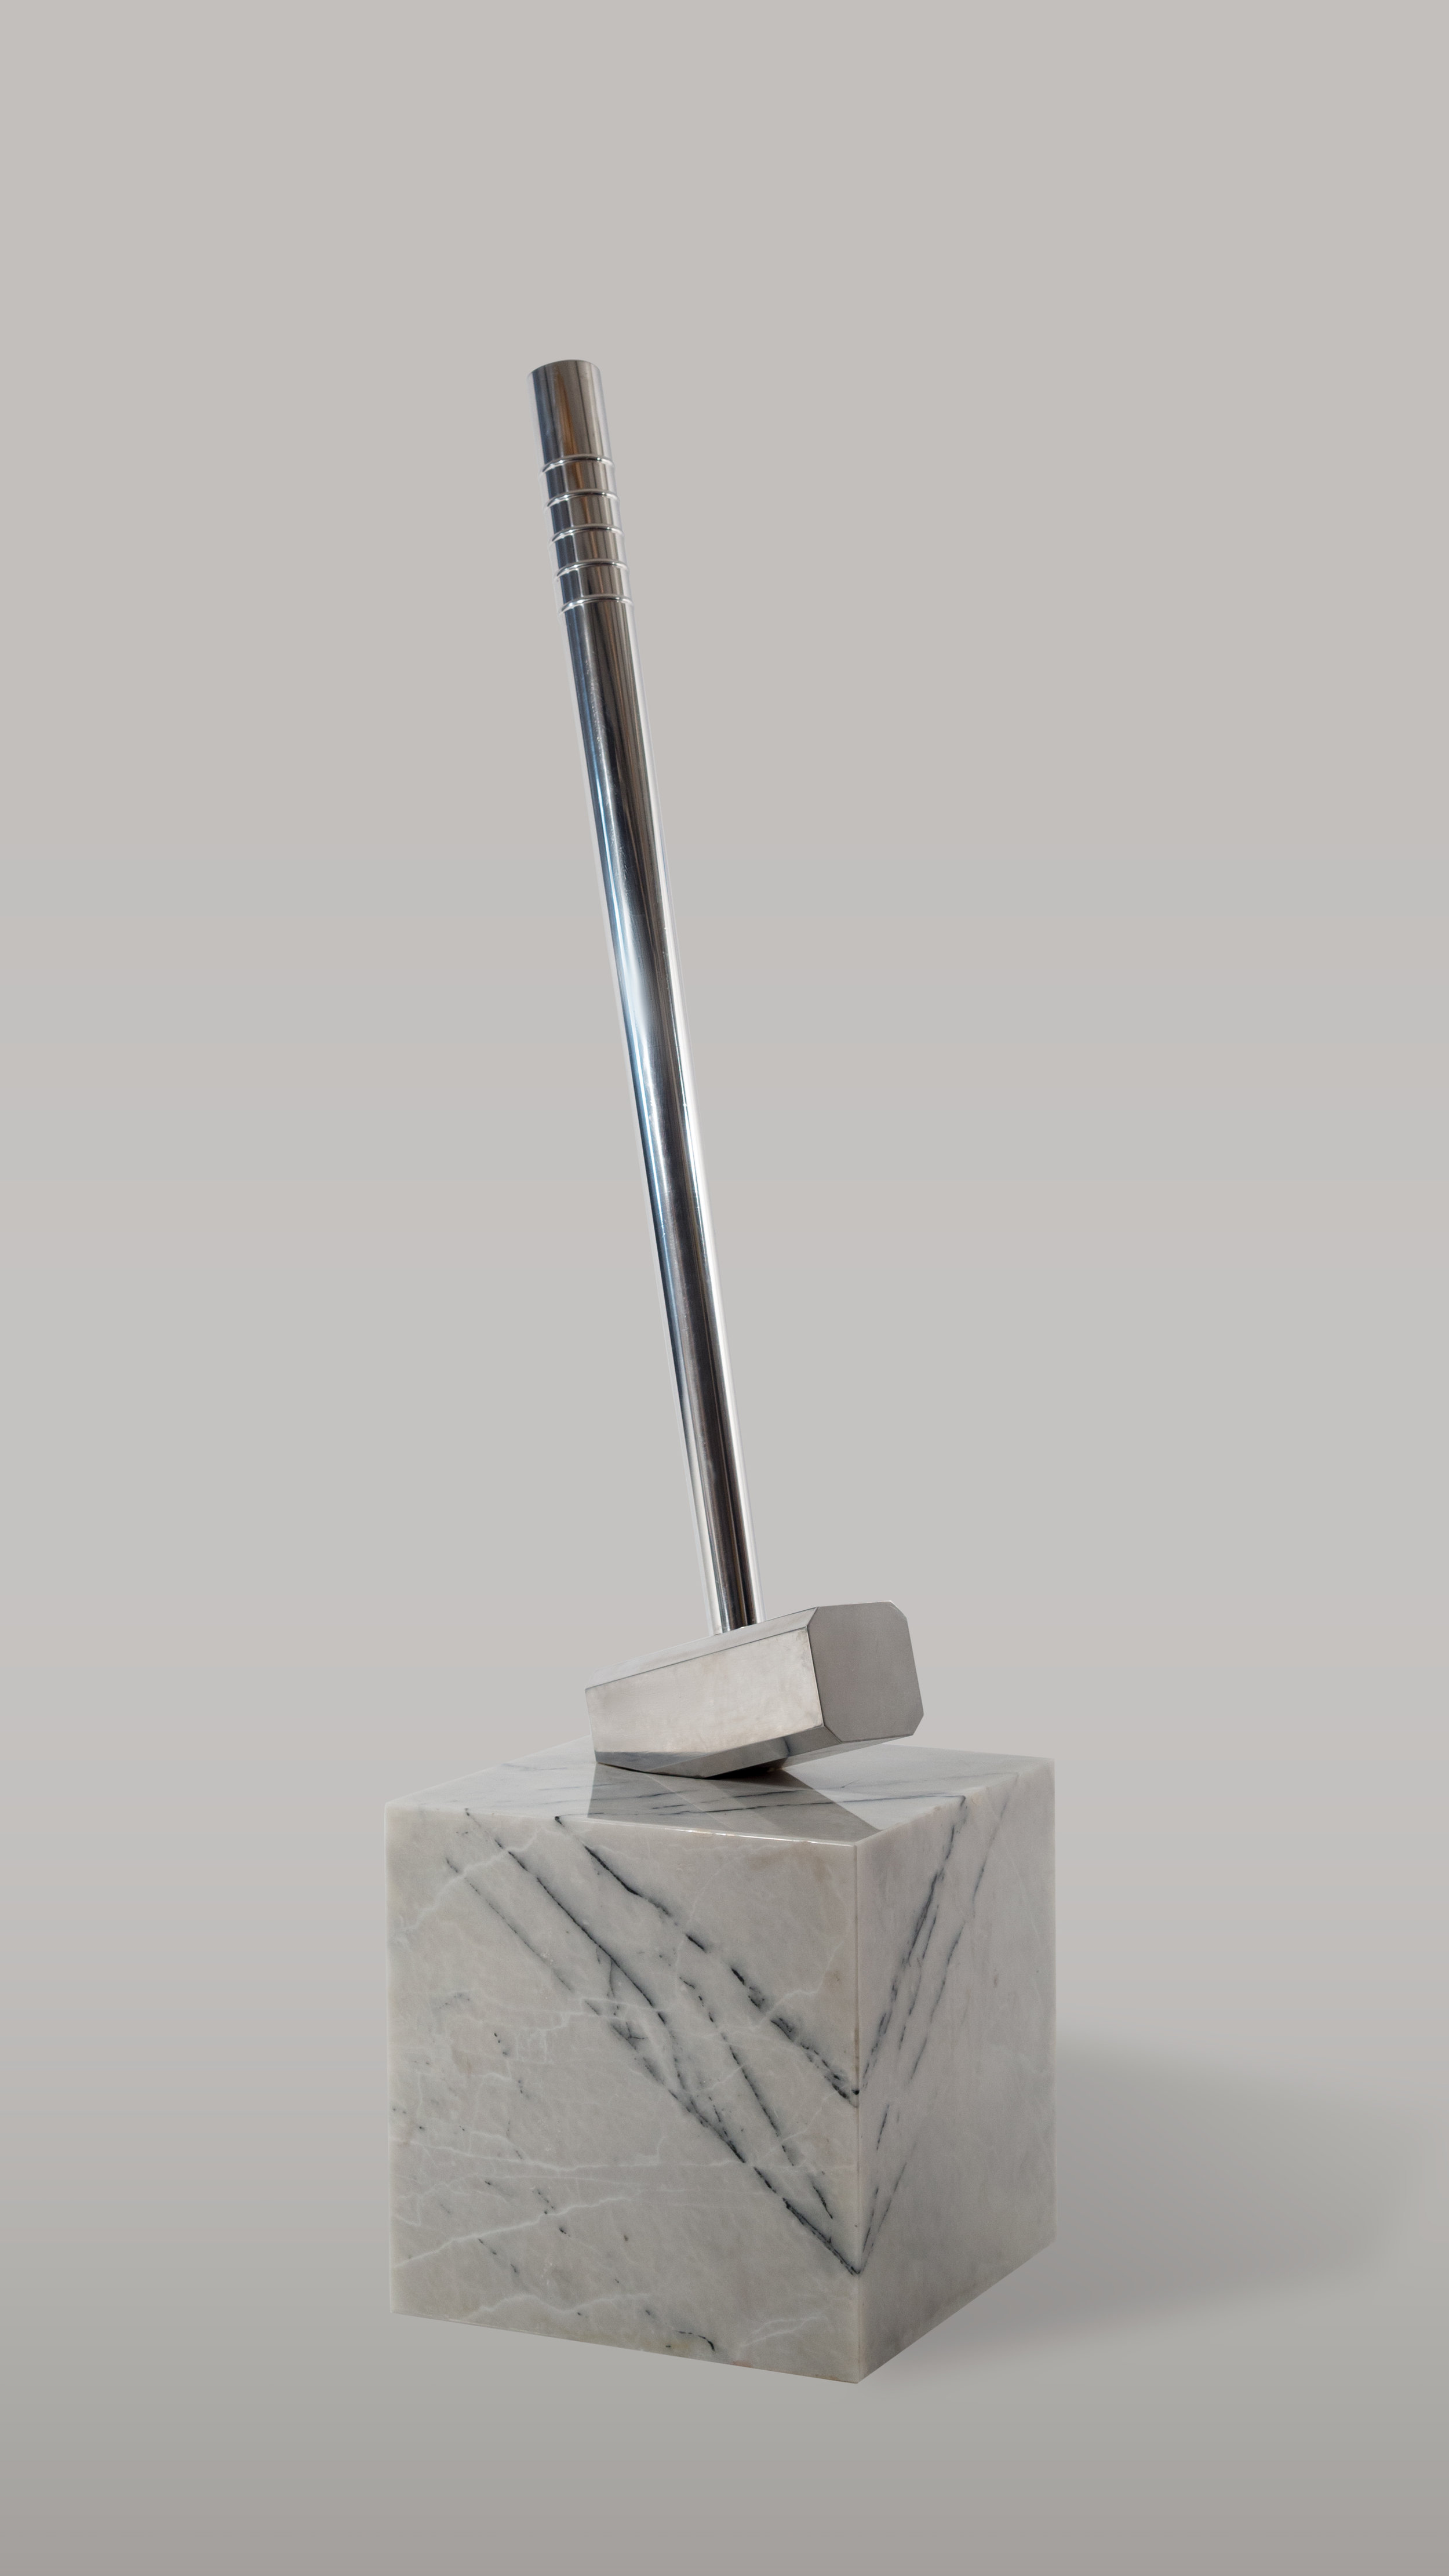 Aluminum Sledgehammer in Marble Cube